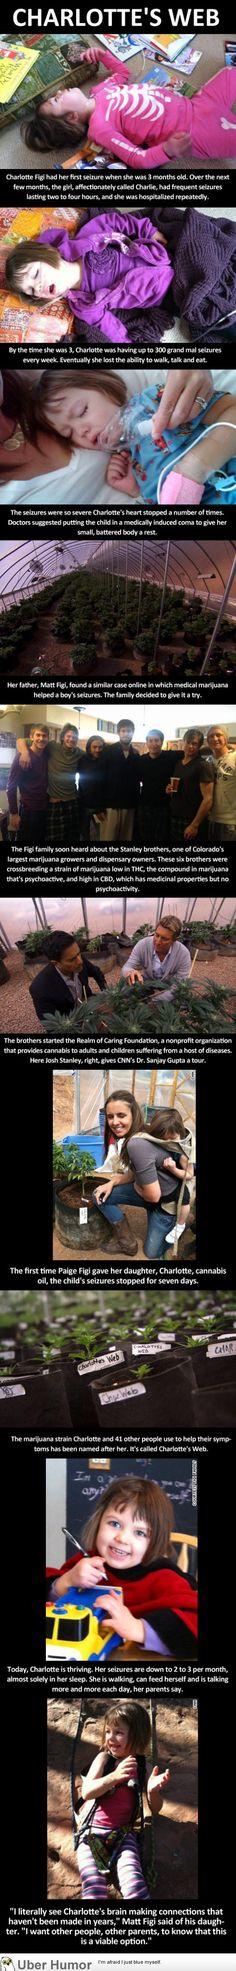 Heartwarming Medical Pot Story - http://geekstumbles.com/funny/uber-humor/heartwarming-medical-pot-story/